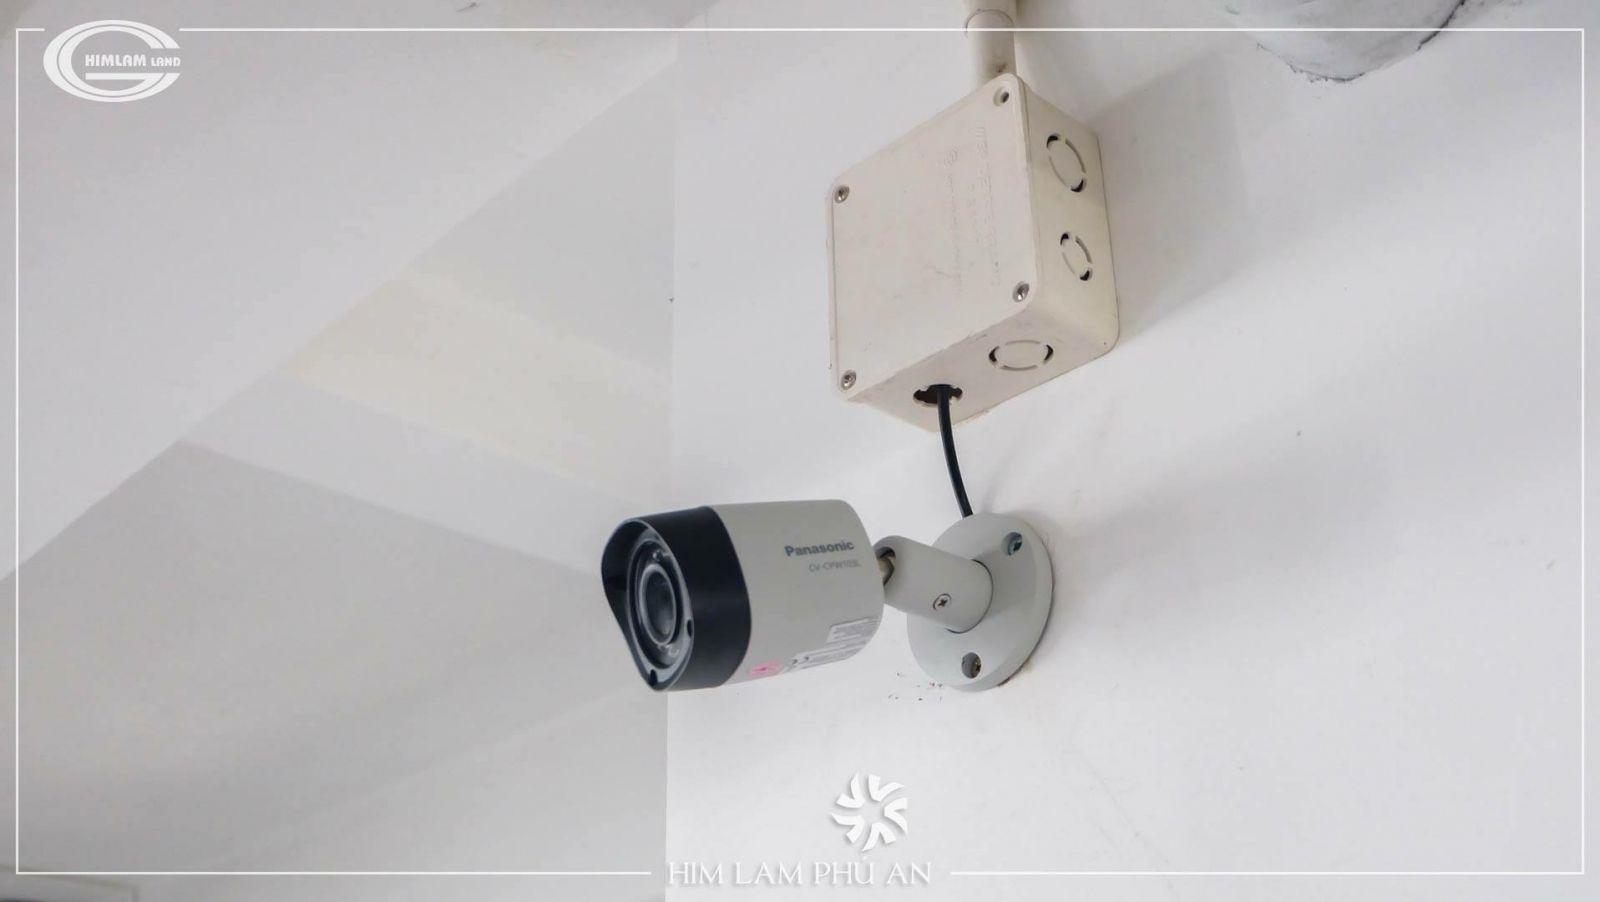 camera-an-ninh-24/7-can-ho-him-lam-phu-an